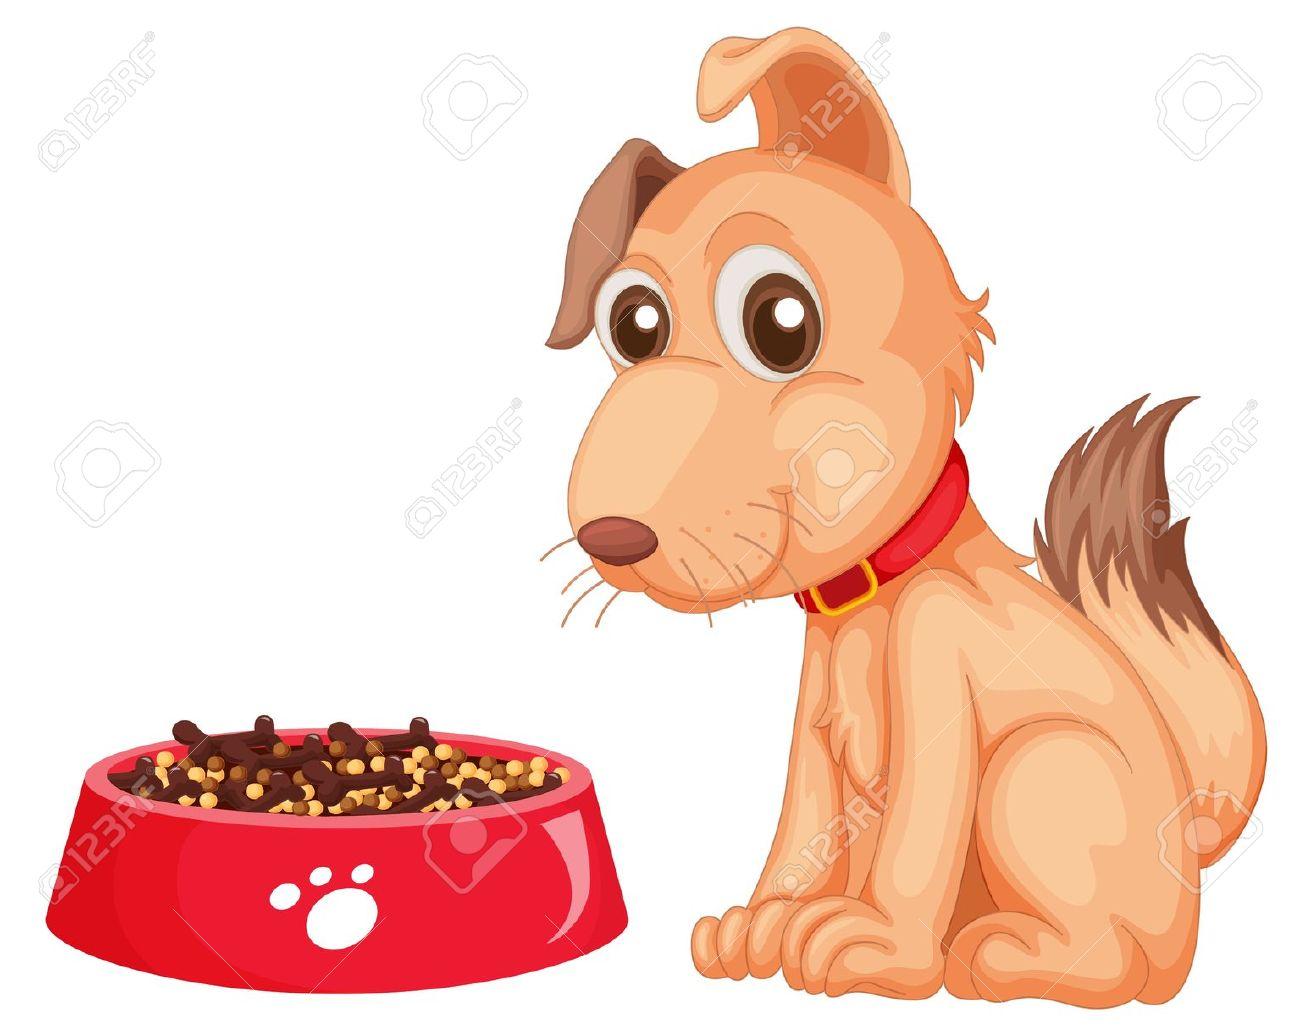 Pice clipart feed dog Pets Feed clipart ClipartFox dog